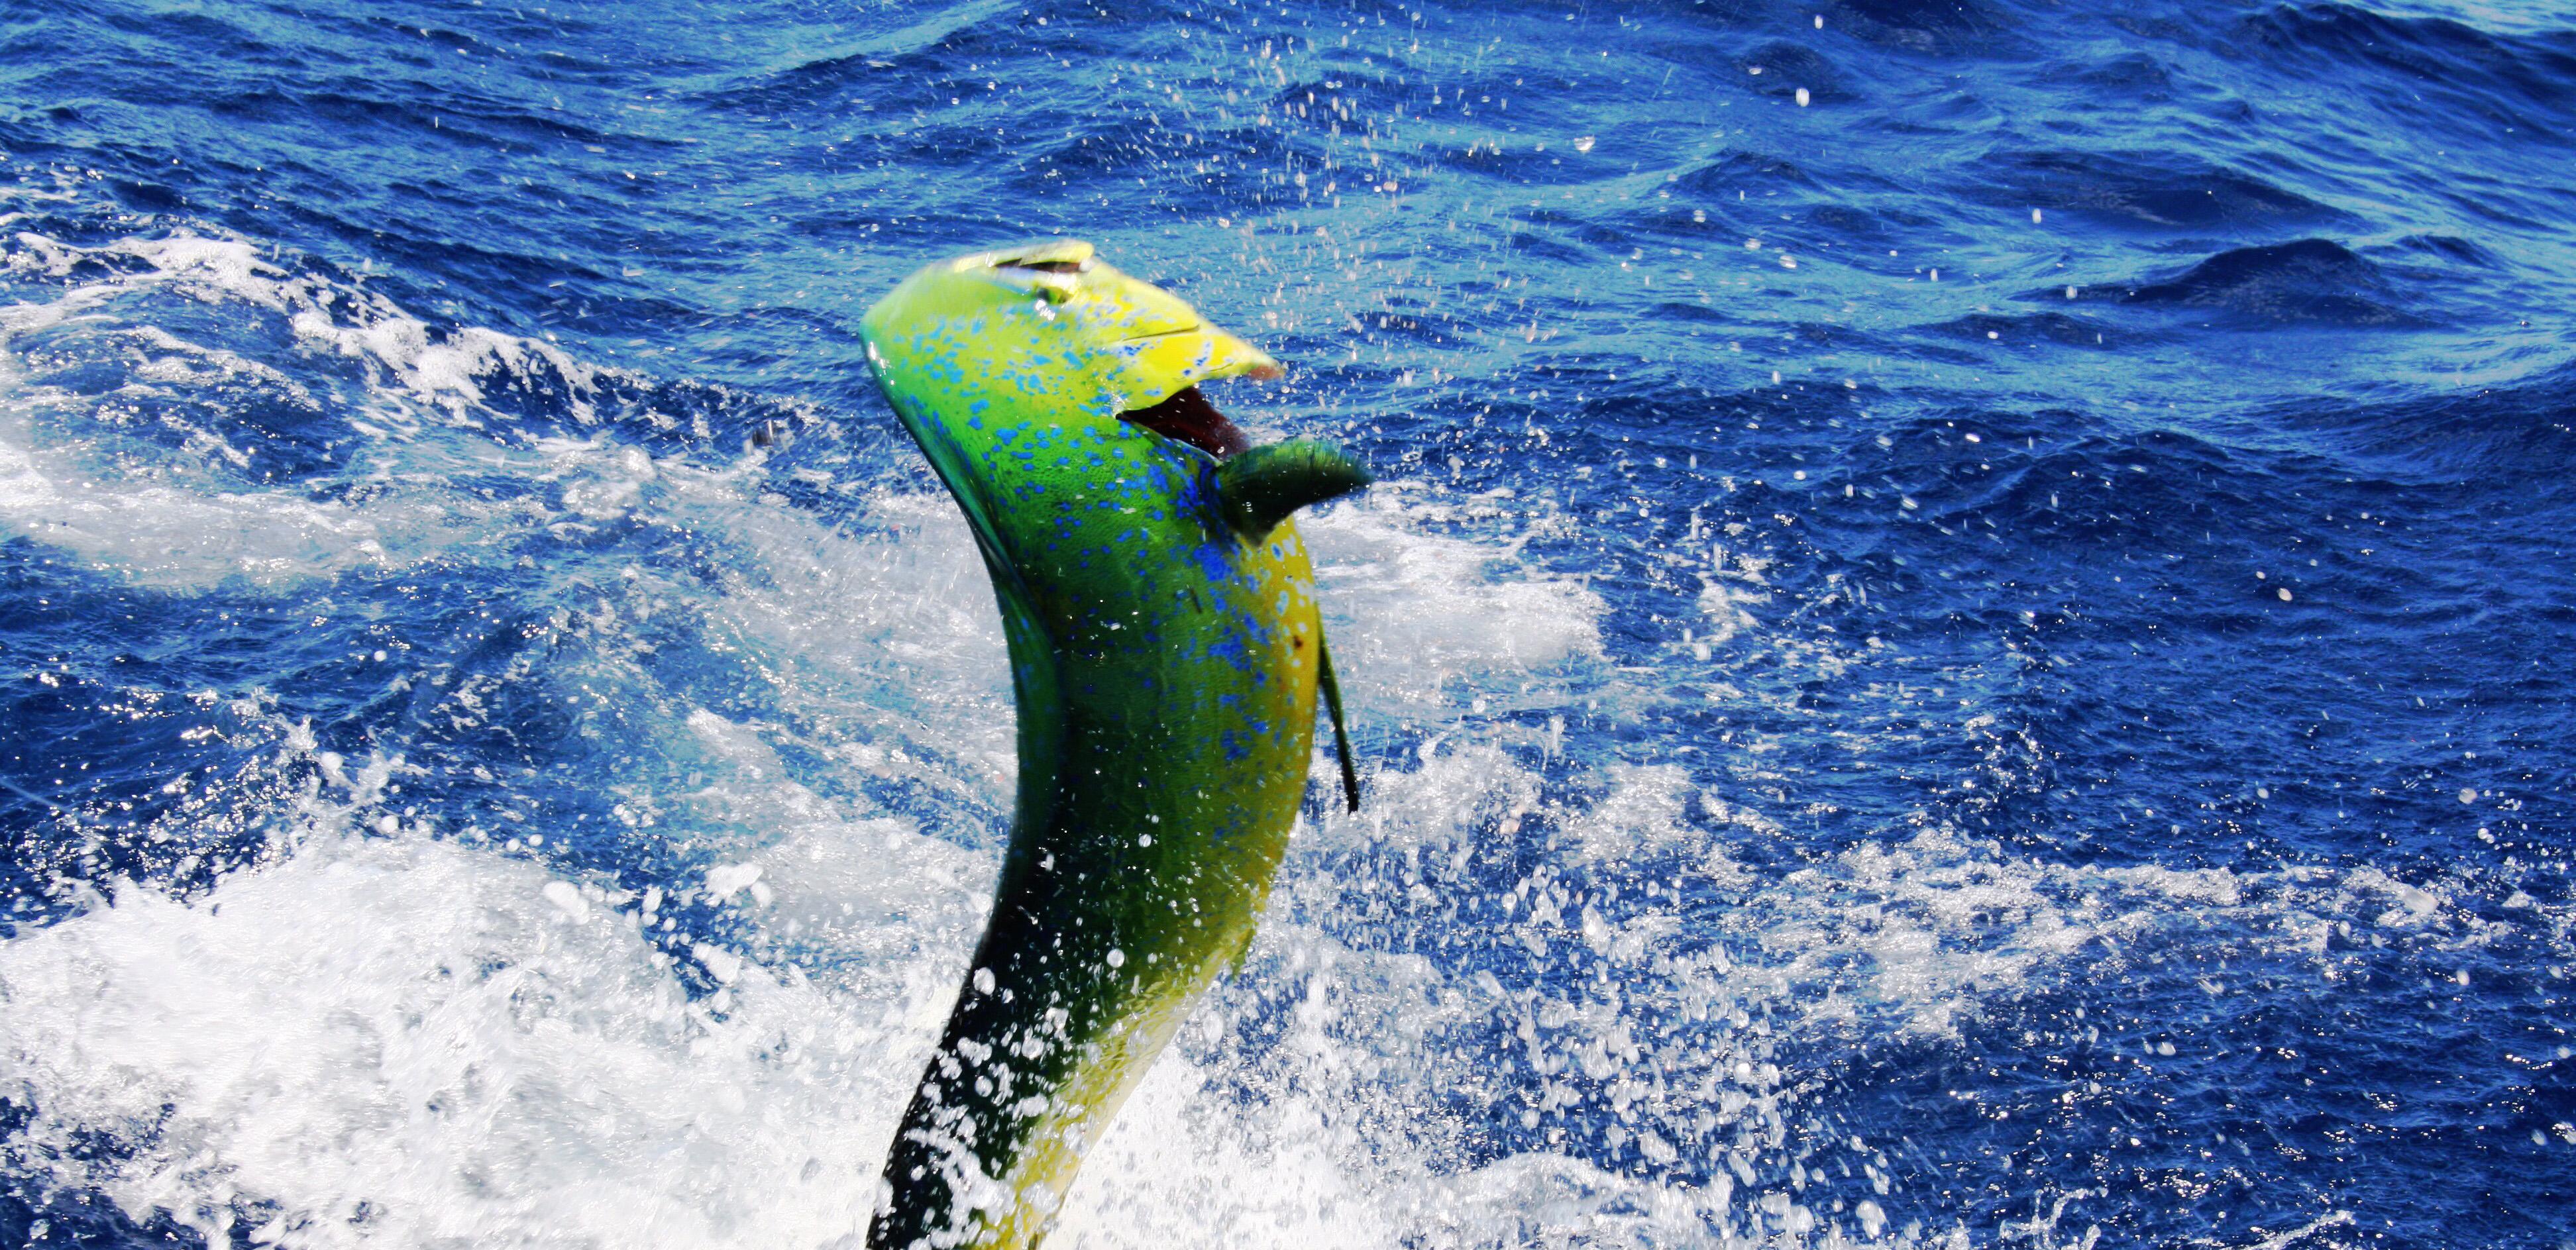 Hatteras Fishing Report | Hatteras Landing